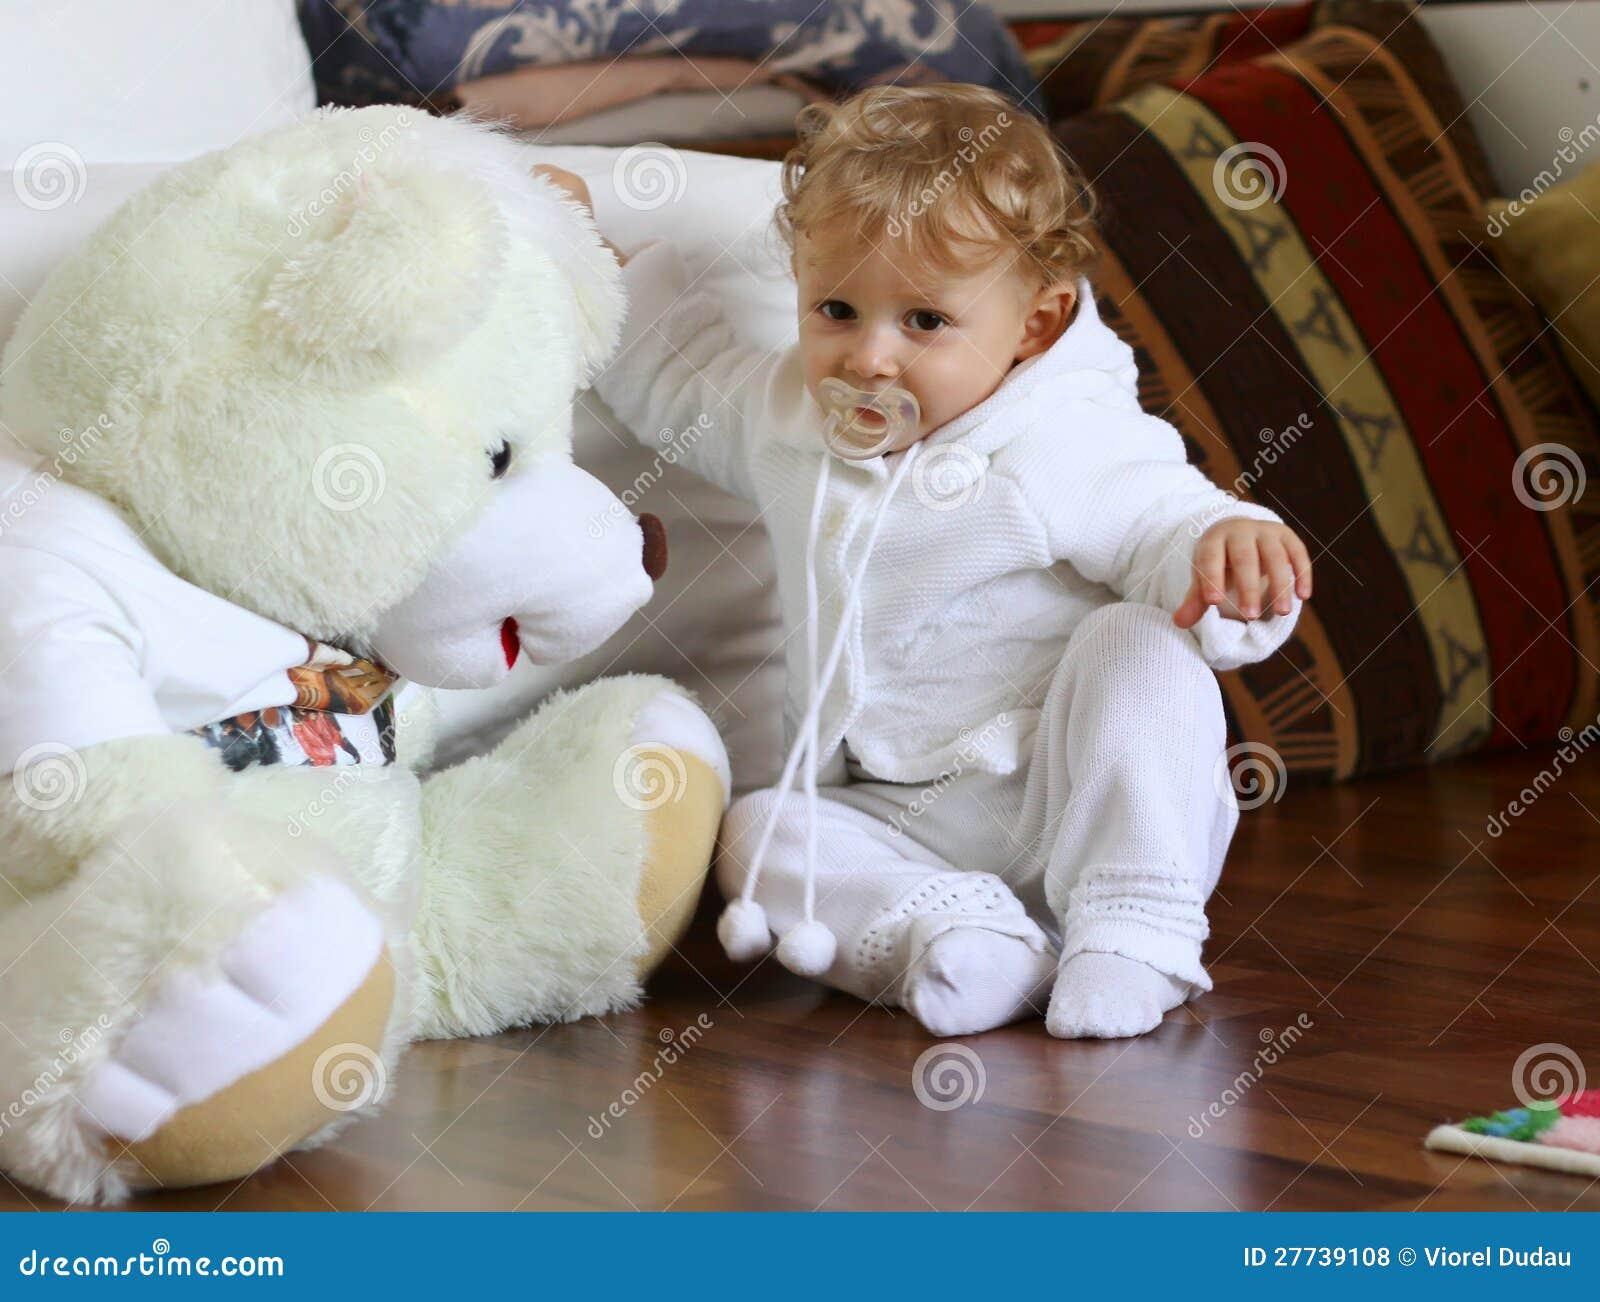 Baby boy with huge teddy bear